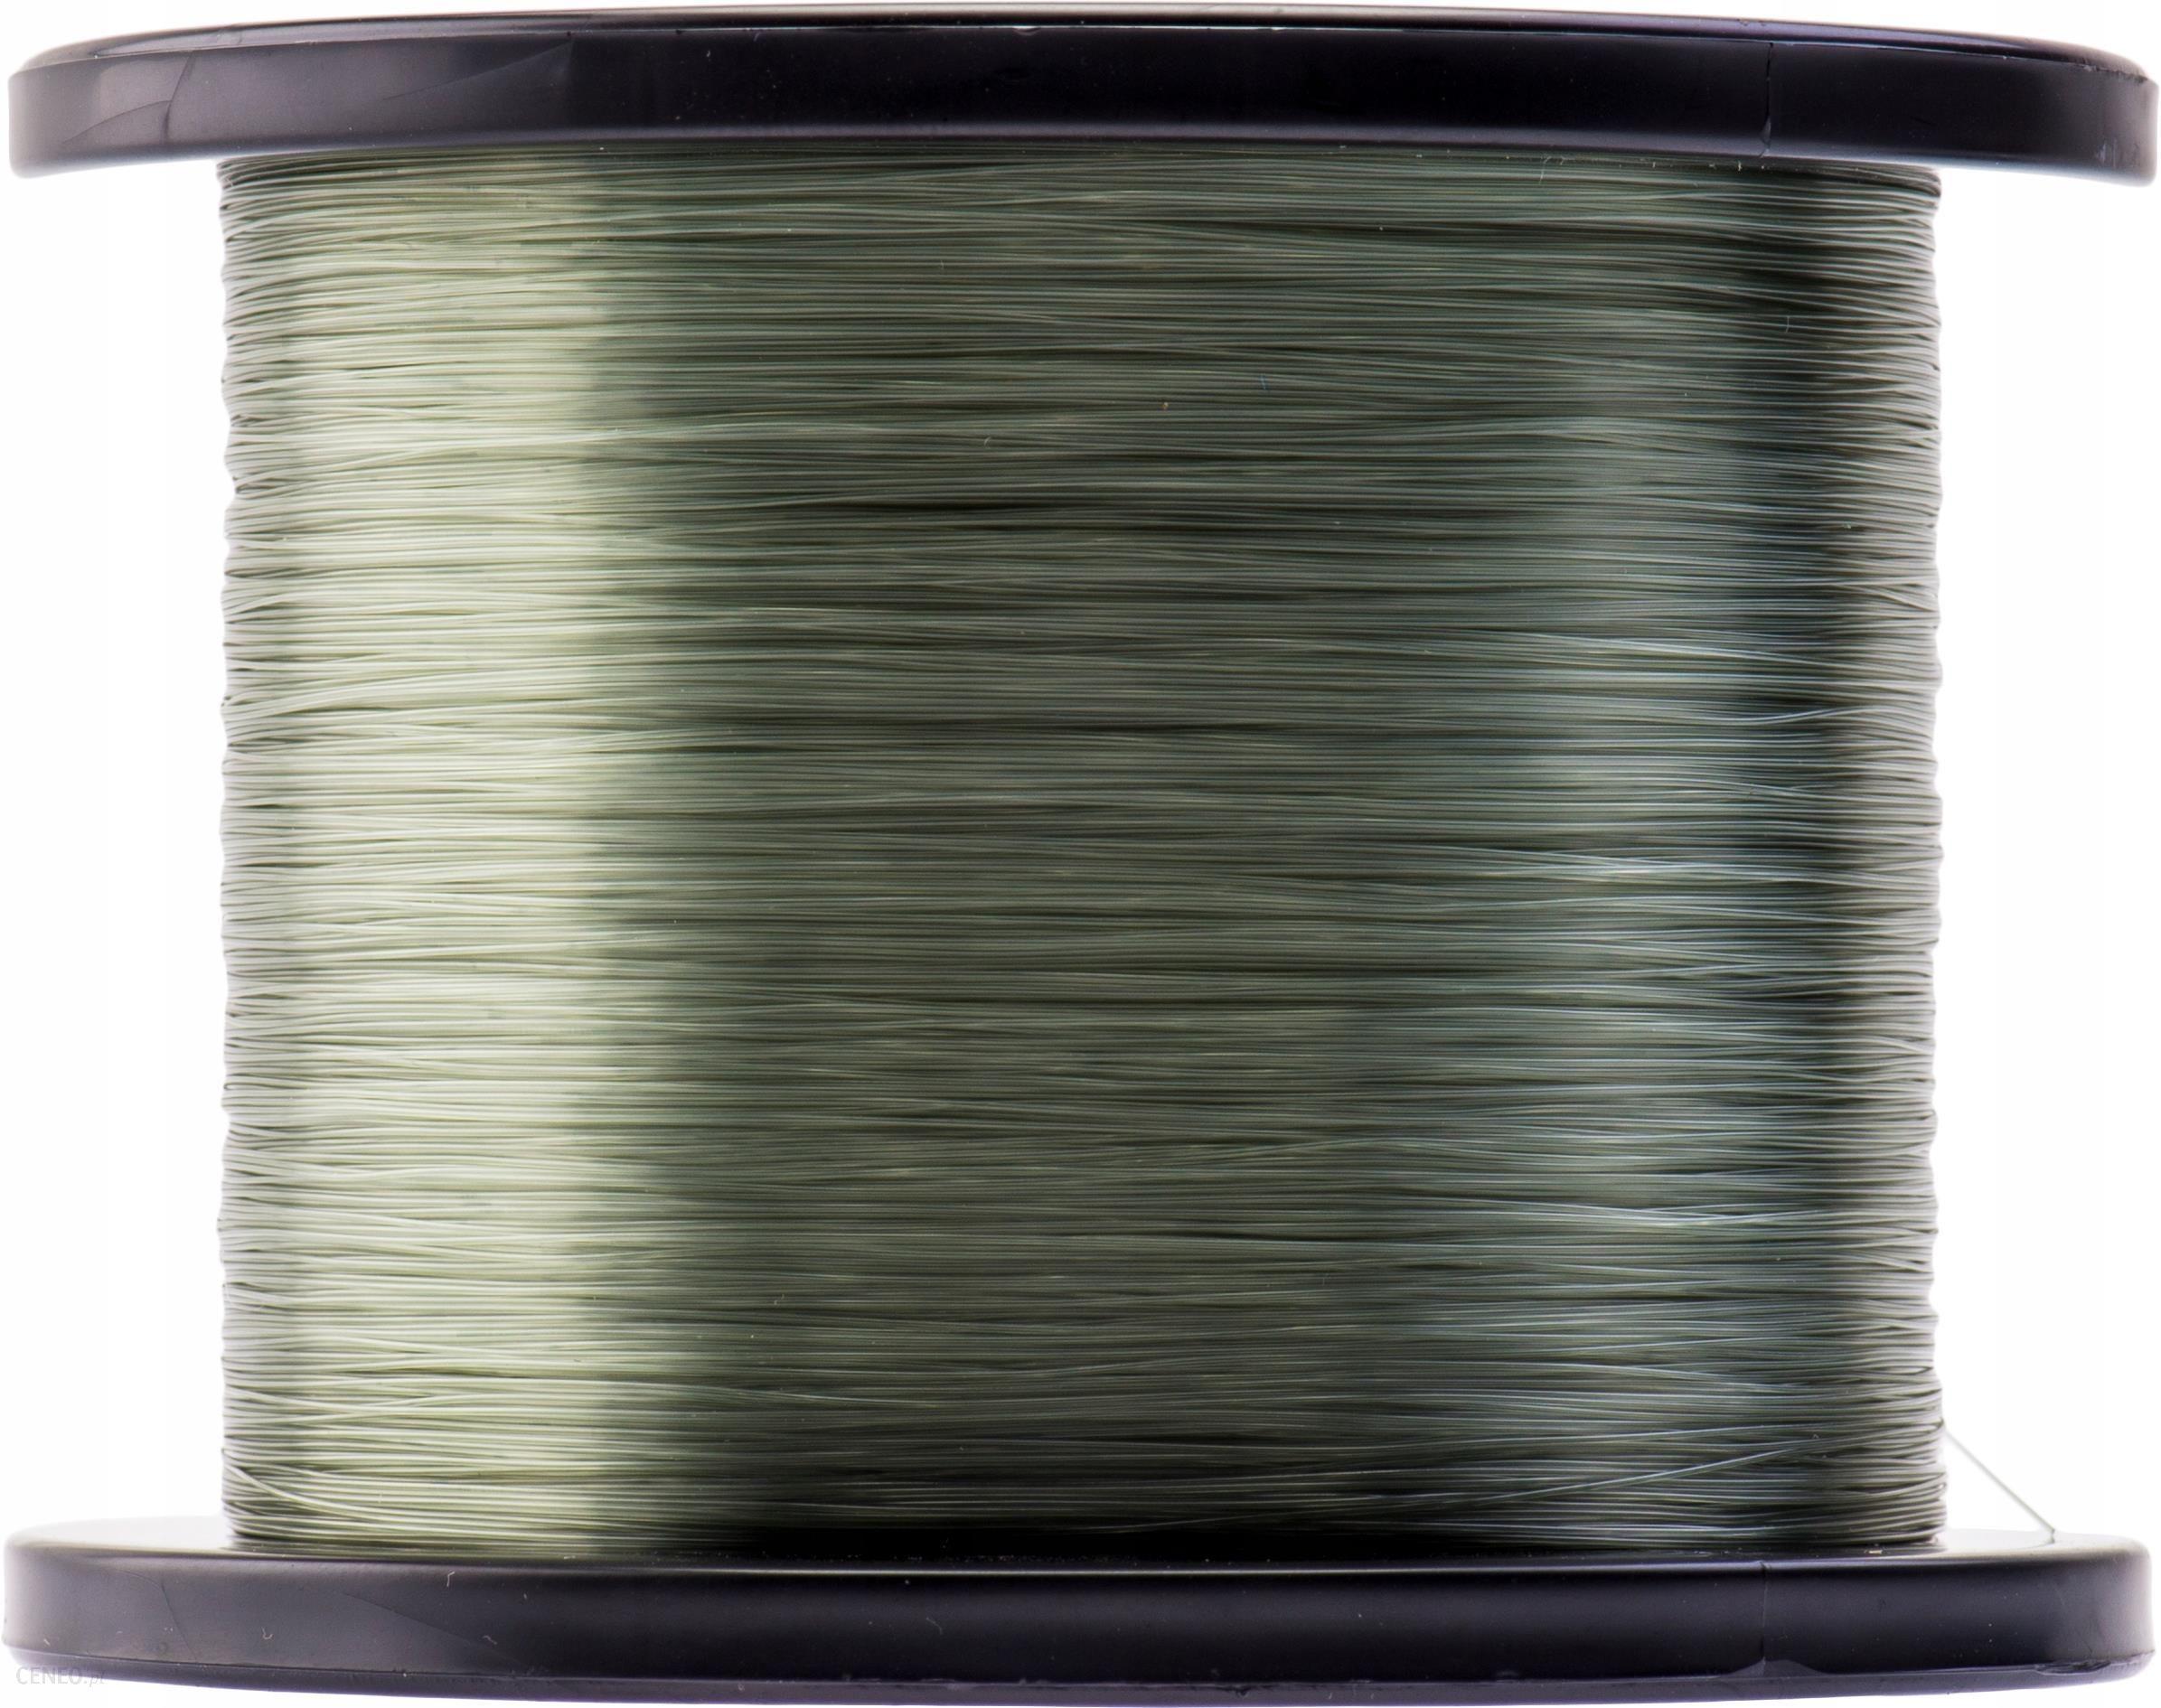 Prologic XLNT HP 1000m 0.33mm Green